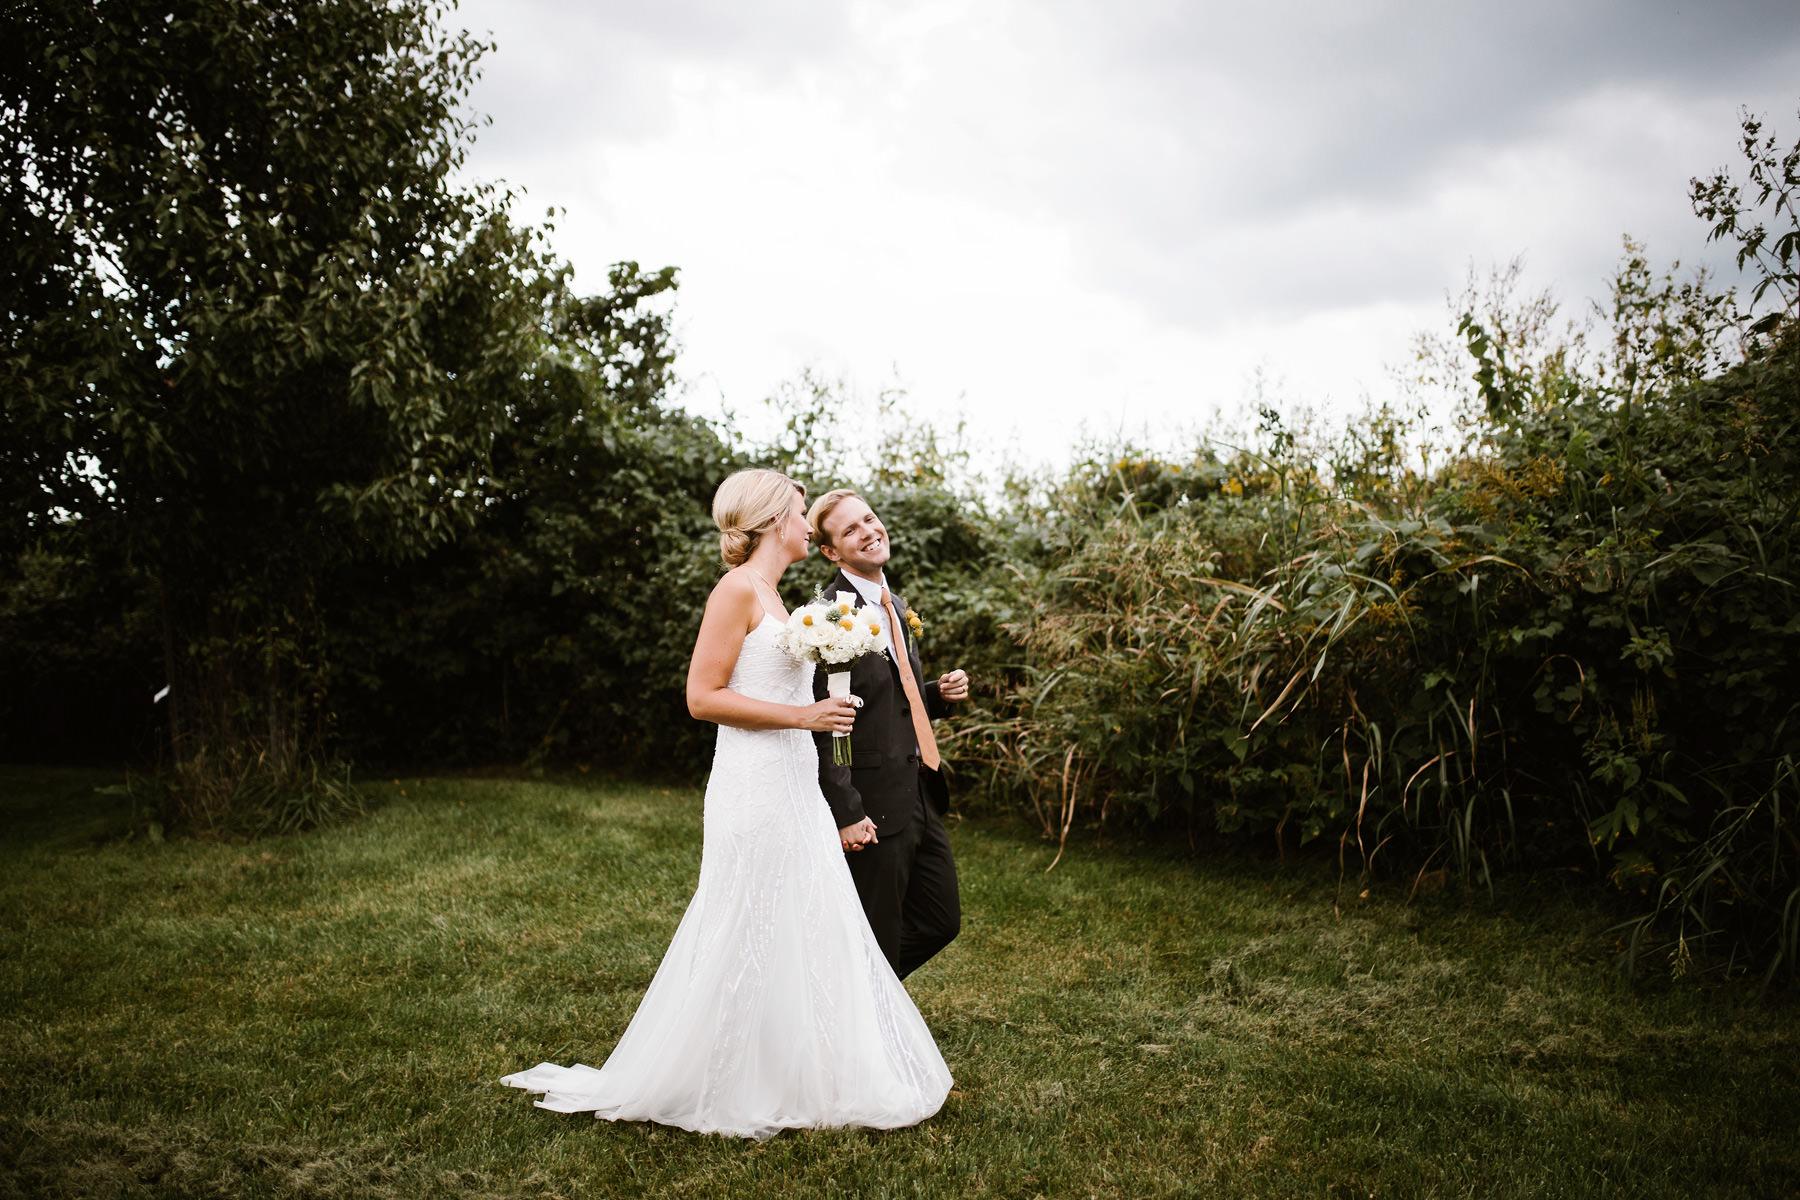 Alldredge Orchard Kansas City_Kindling Wedding Photography BLOG 54.JPG